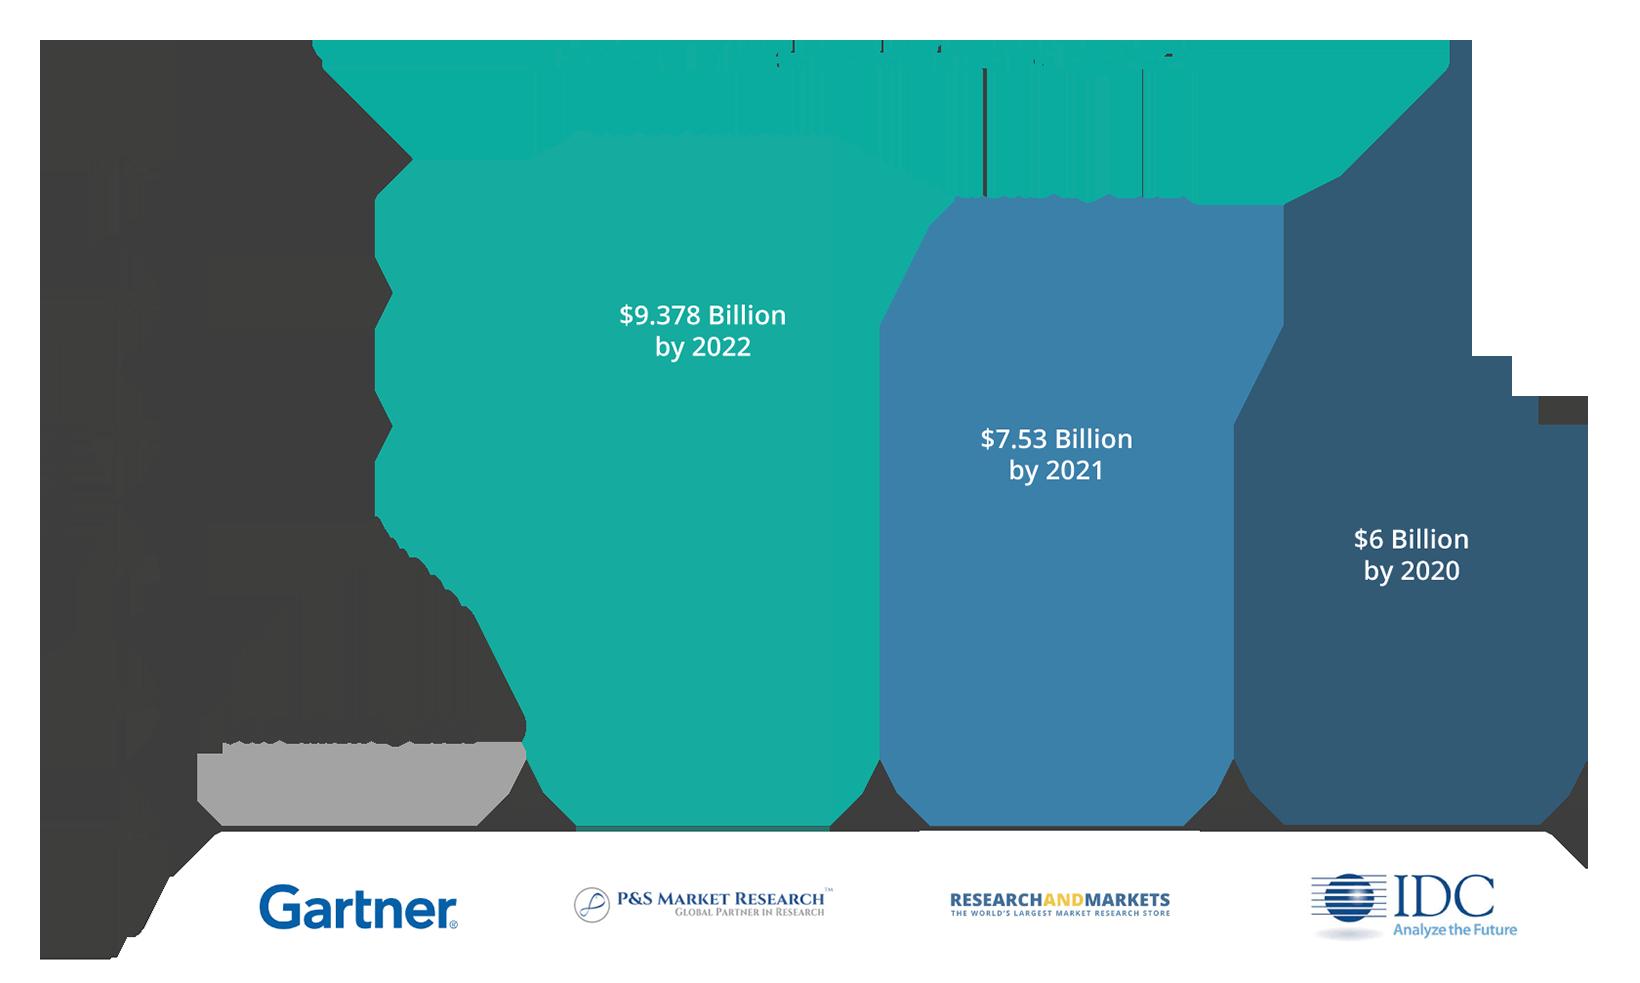 SD-WAN Market Prediction by 2020